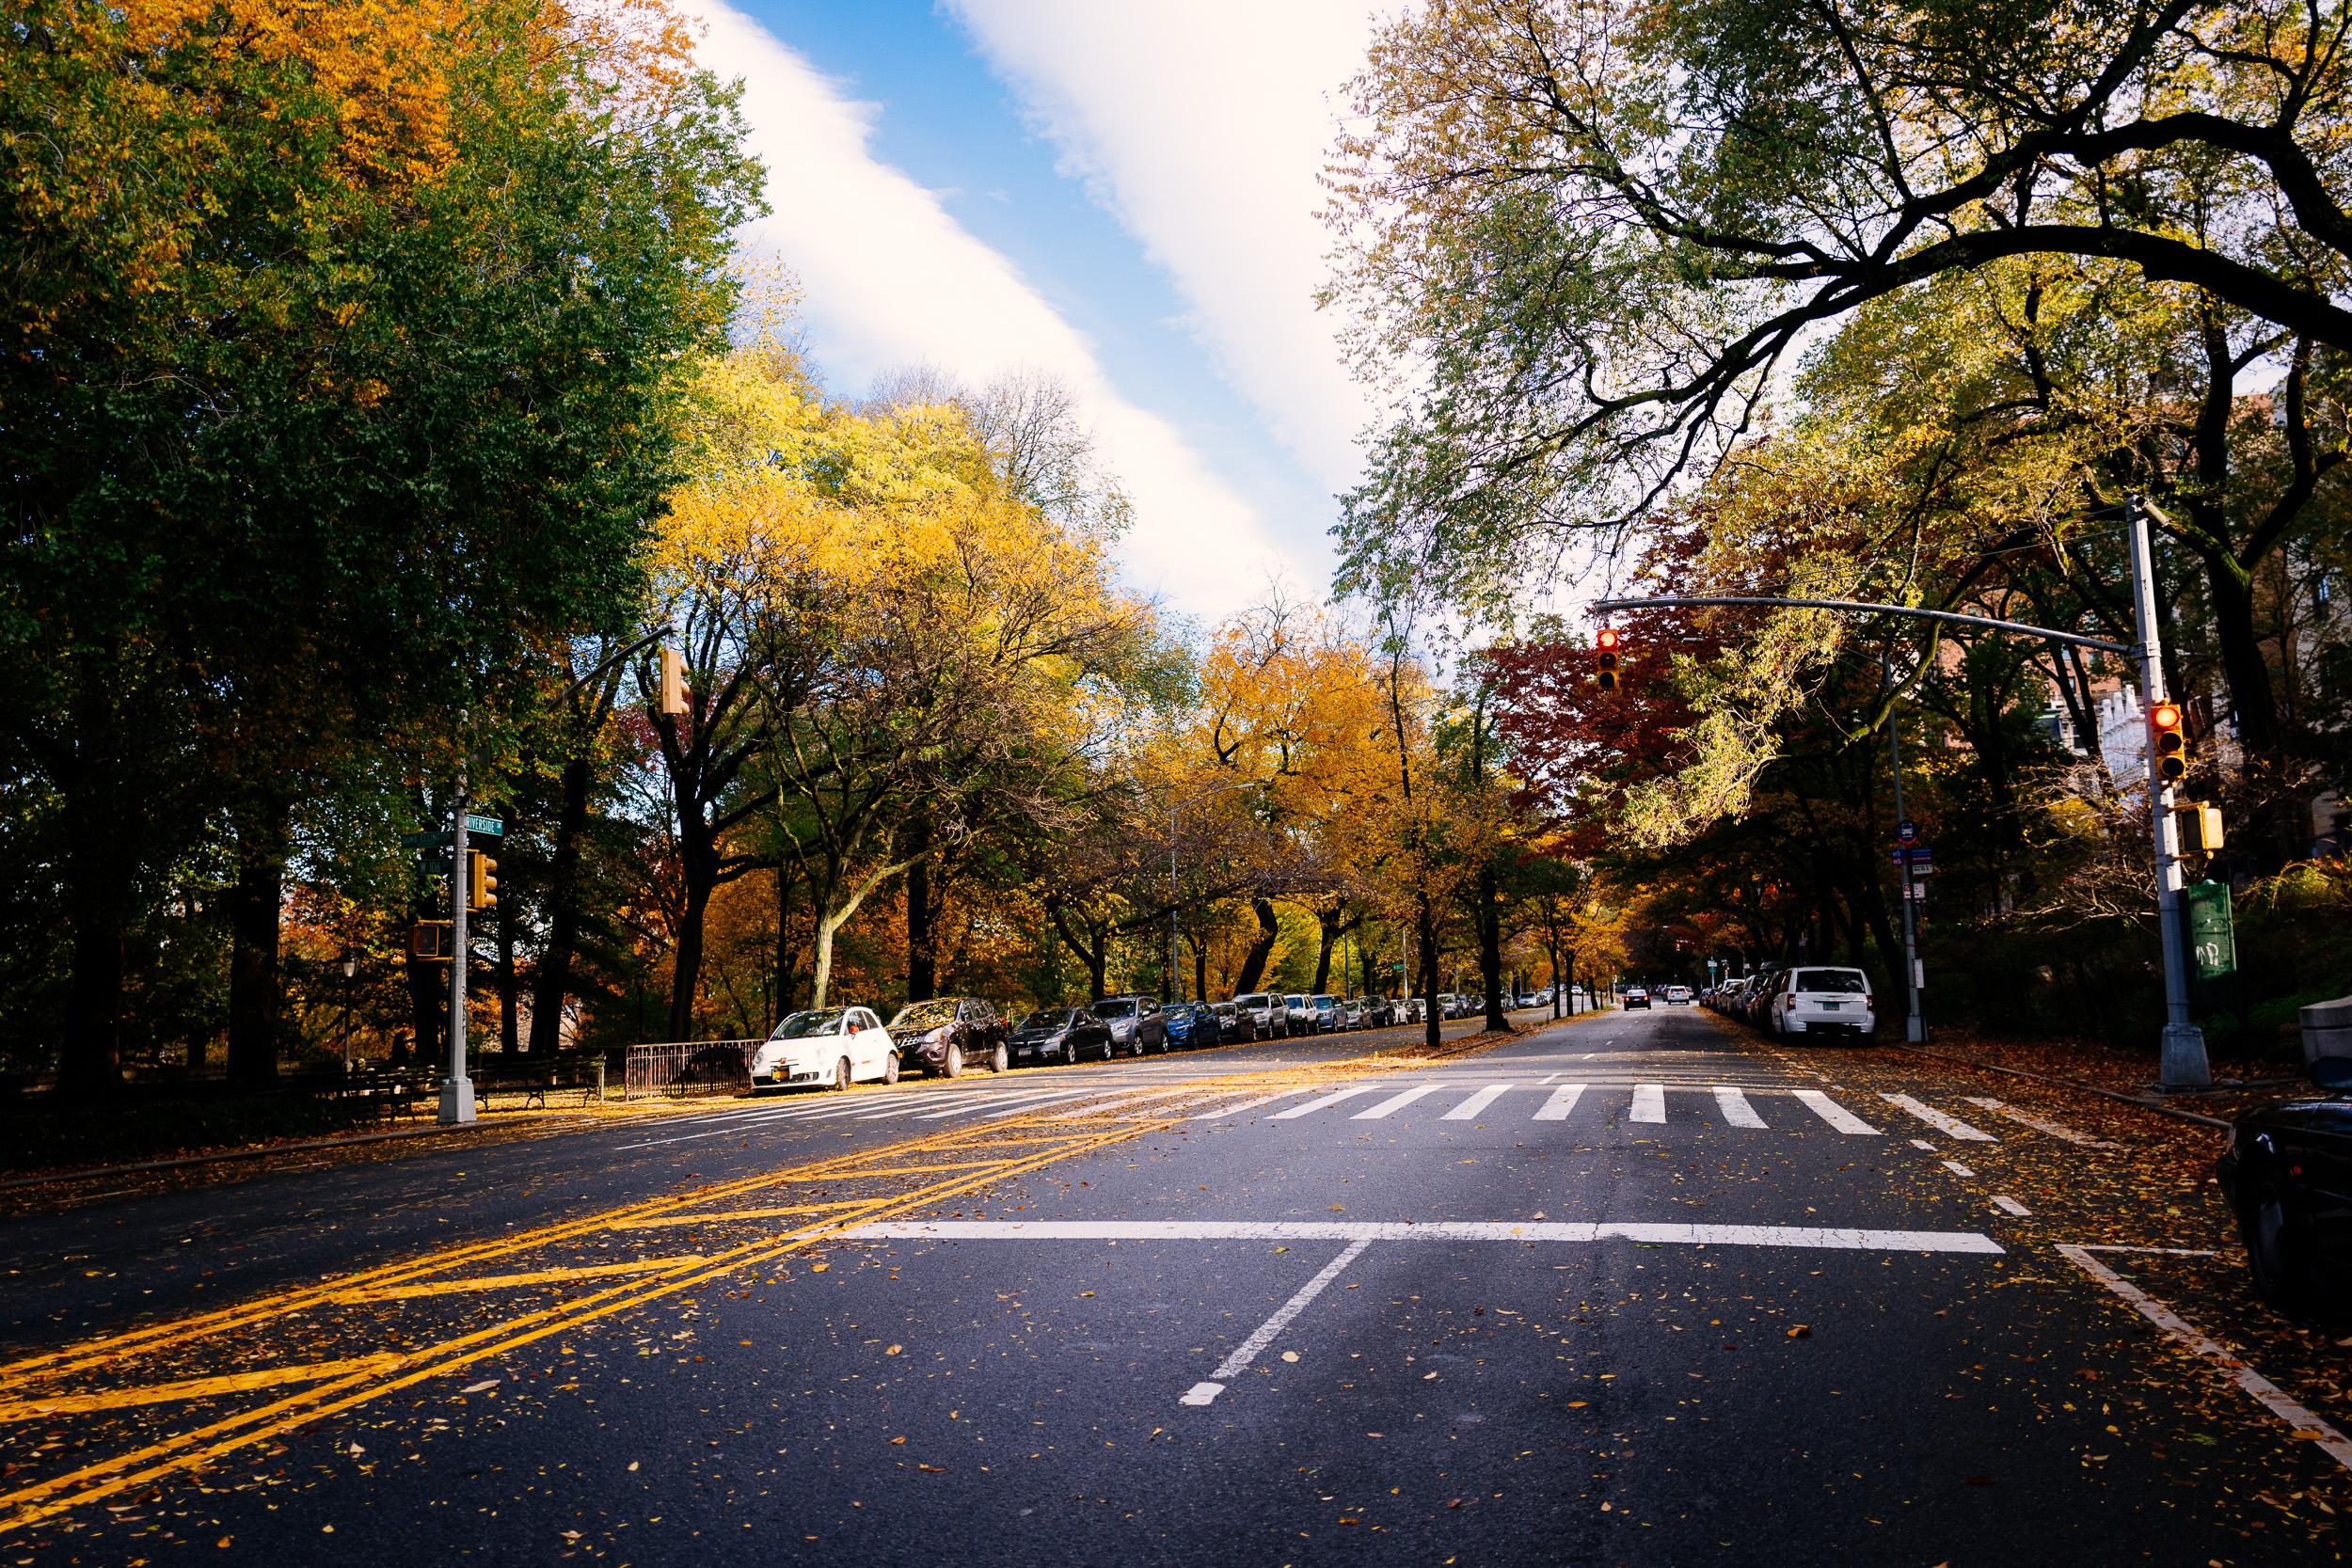 photo-rhetoric-to-be-determined-river-road-fall-foliage-5000.jpg